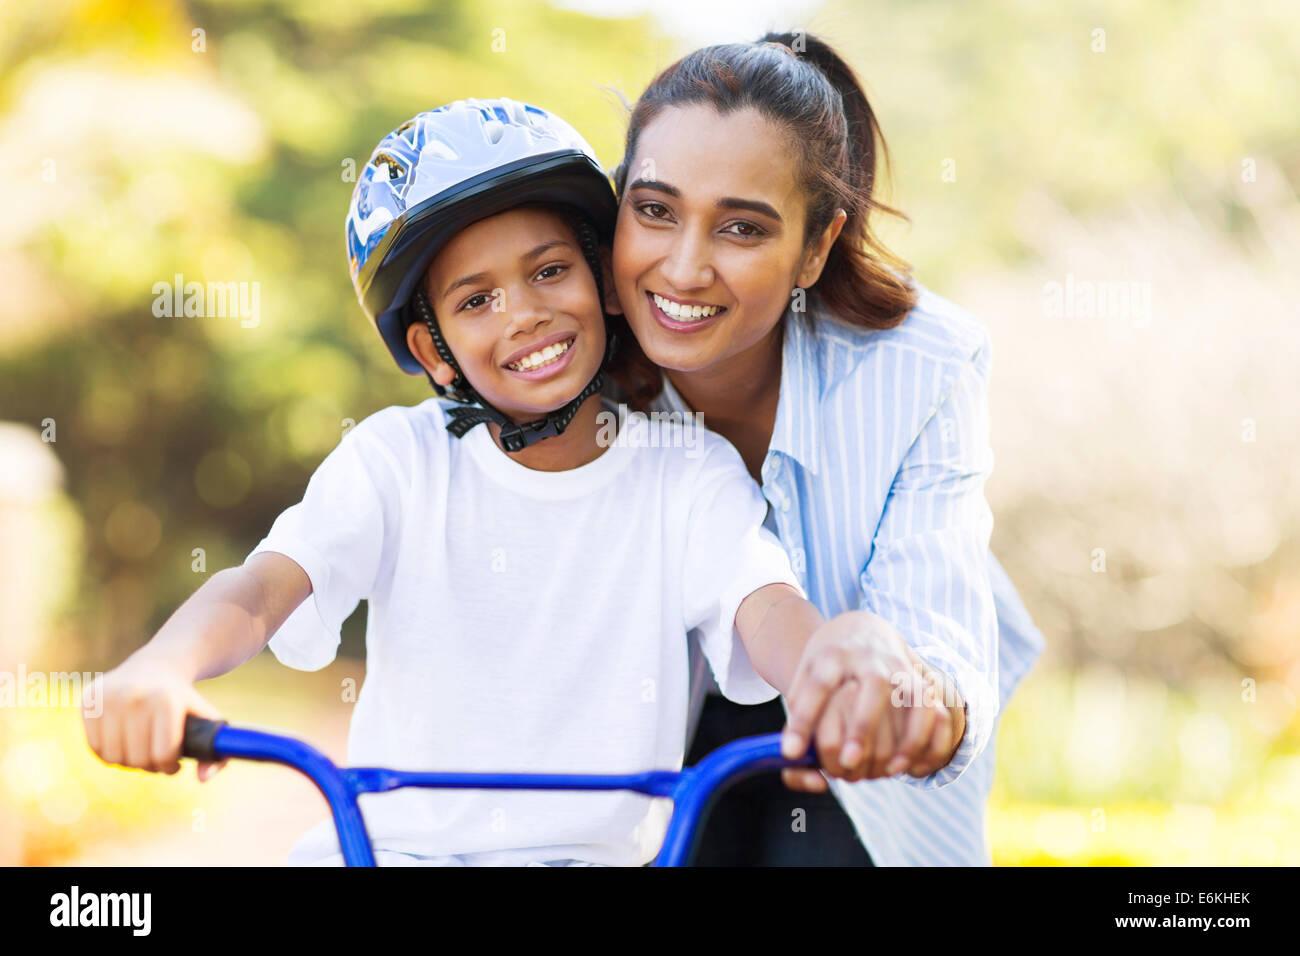 KARINA: Son Boy Mother Time One Ghanta